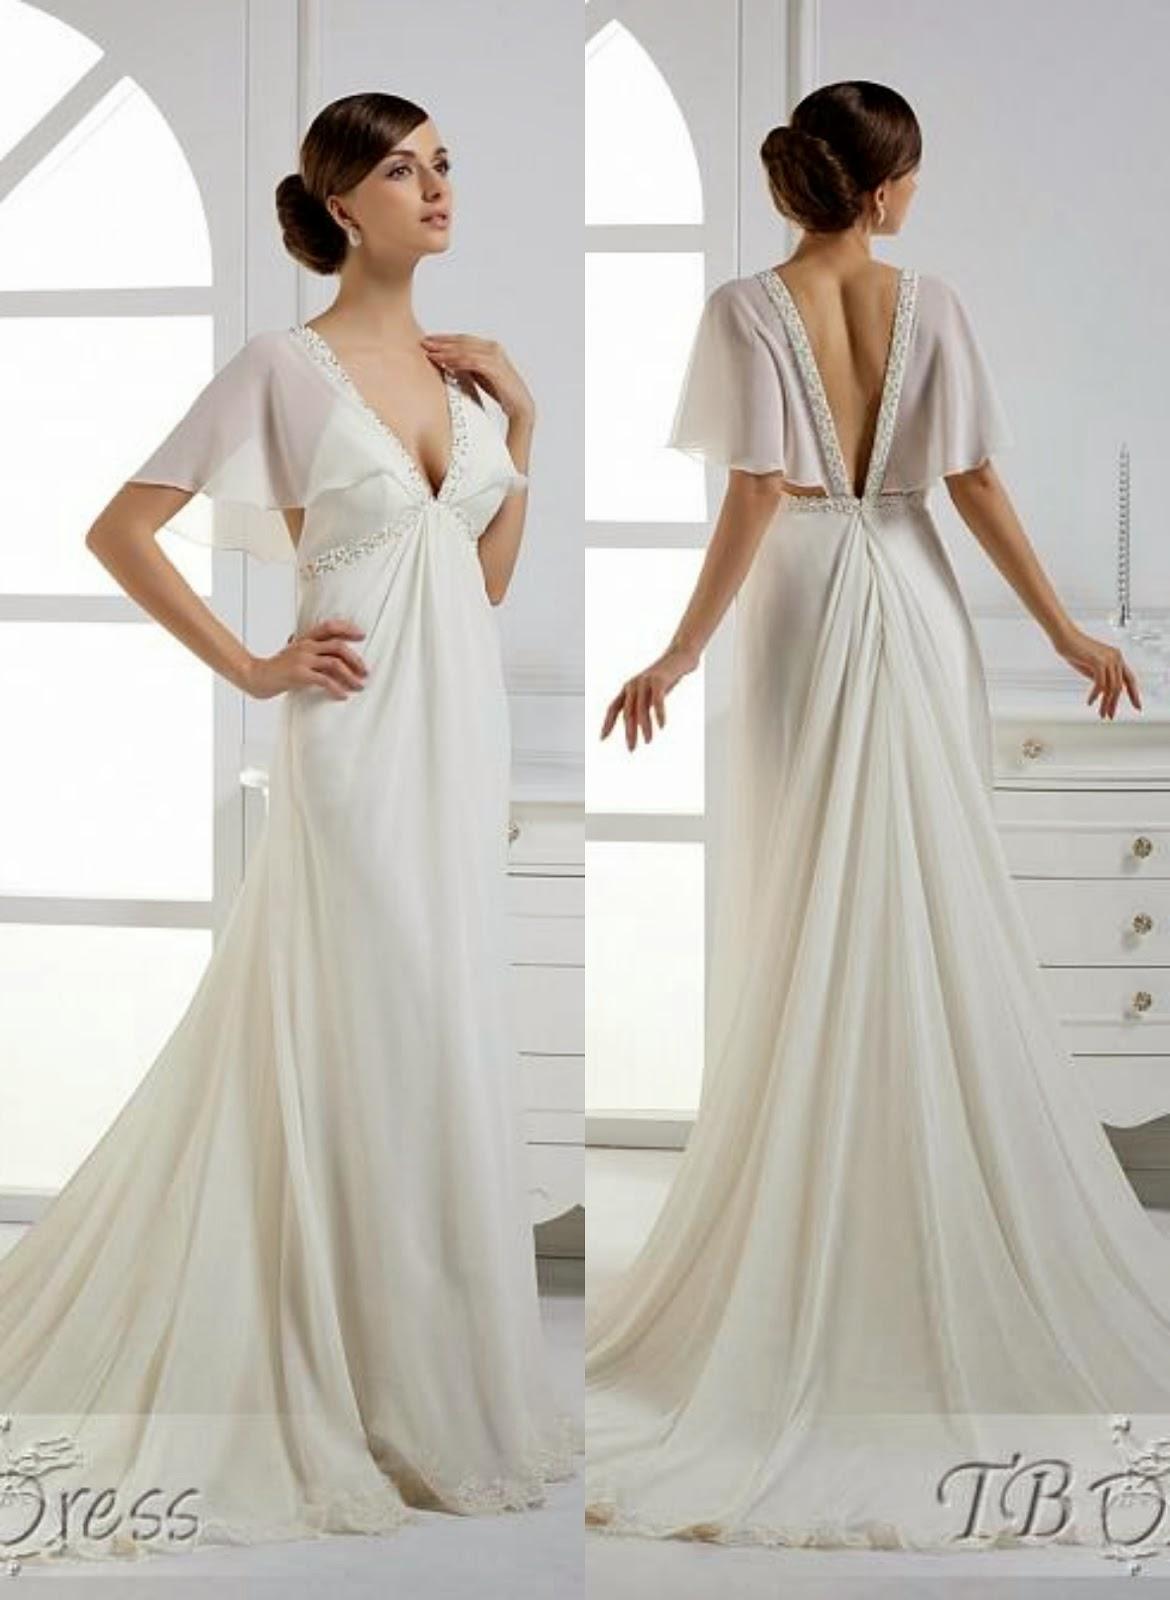 maternity wedding dresses maternity dresses for wedding Maternity Wedding Dresses